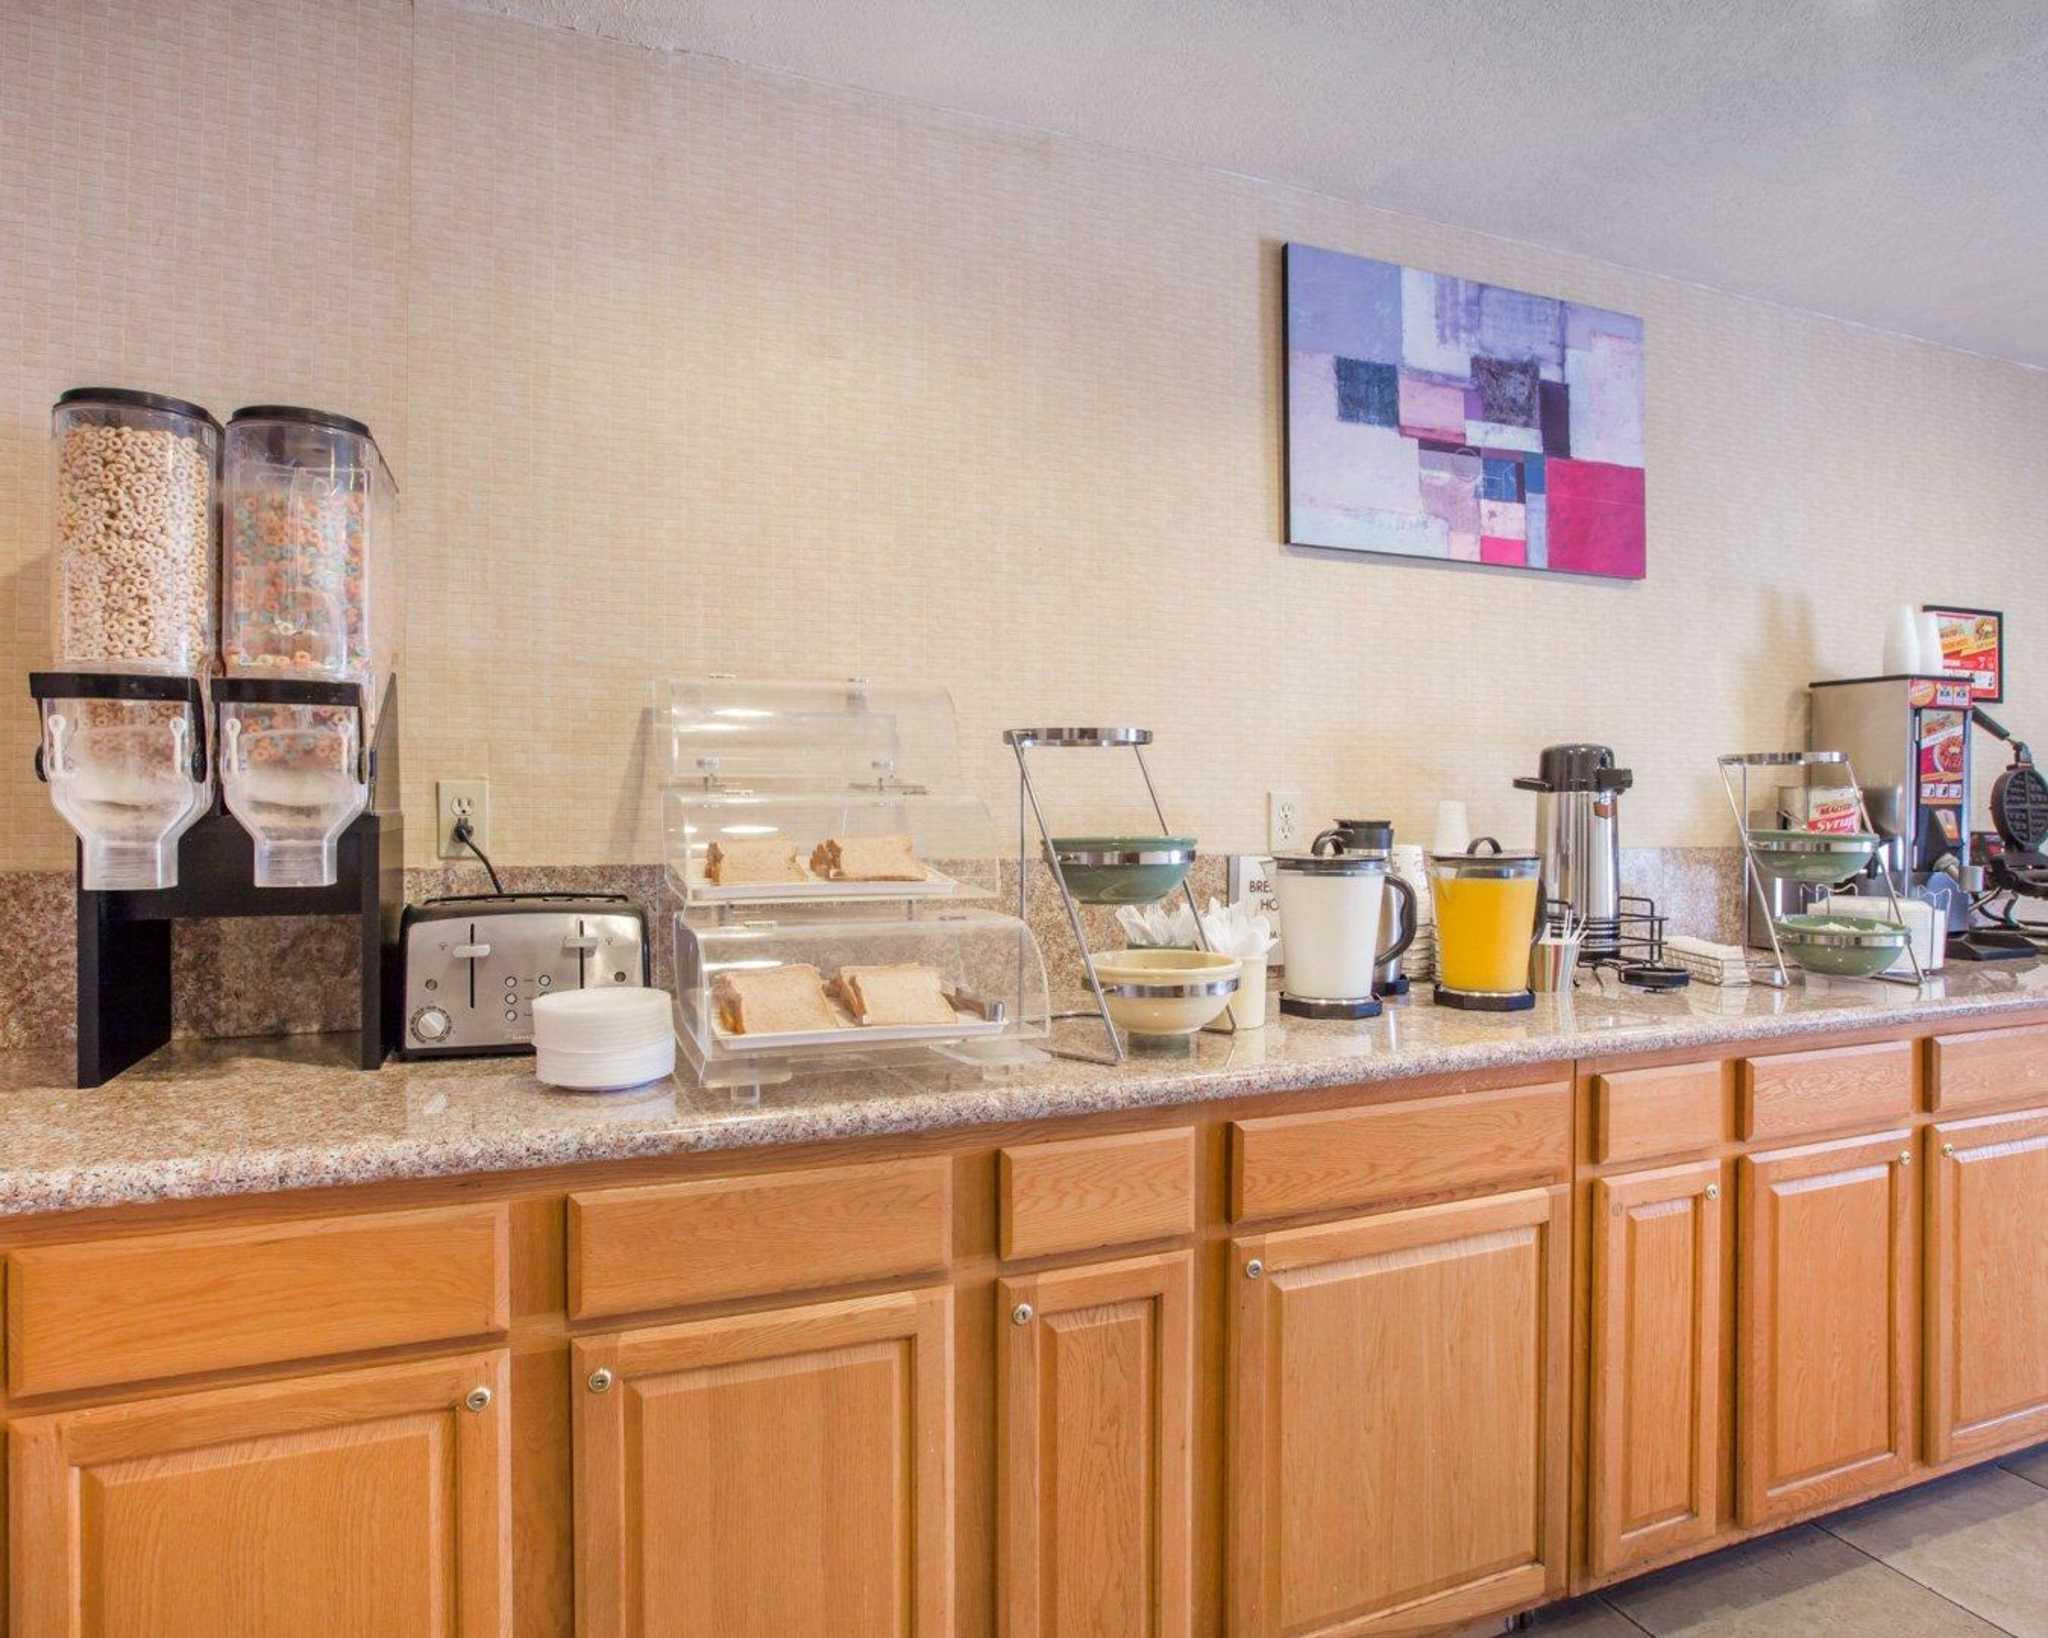 Econo Lodge Inn & Suites Lodi image 10